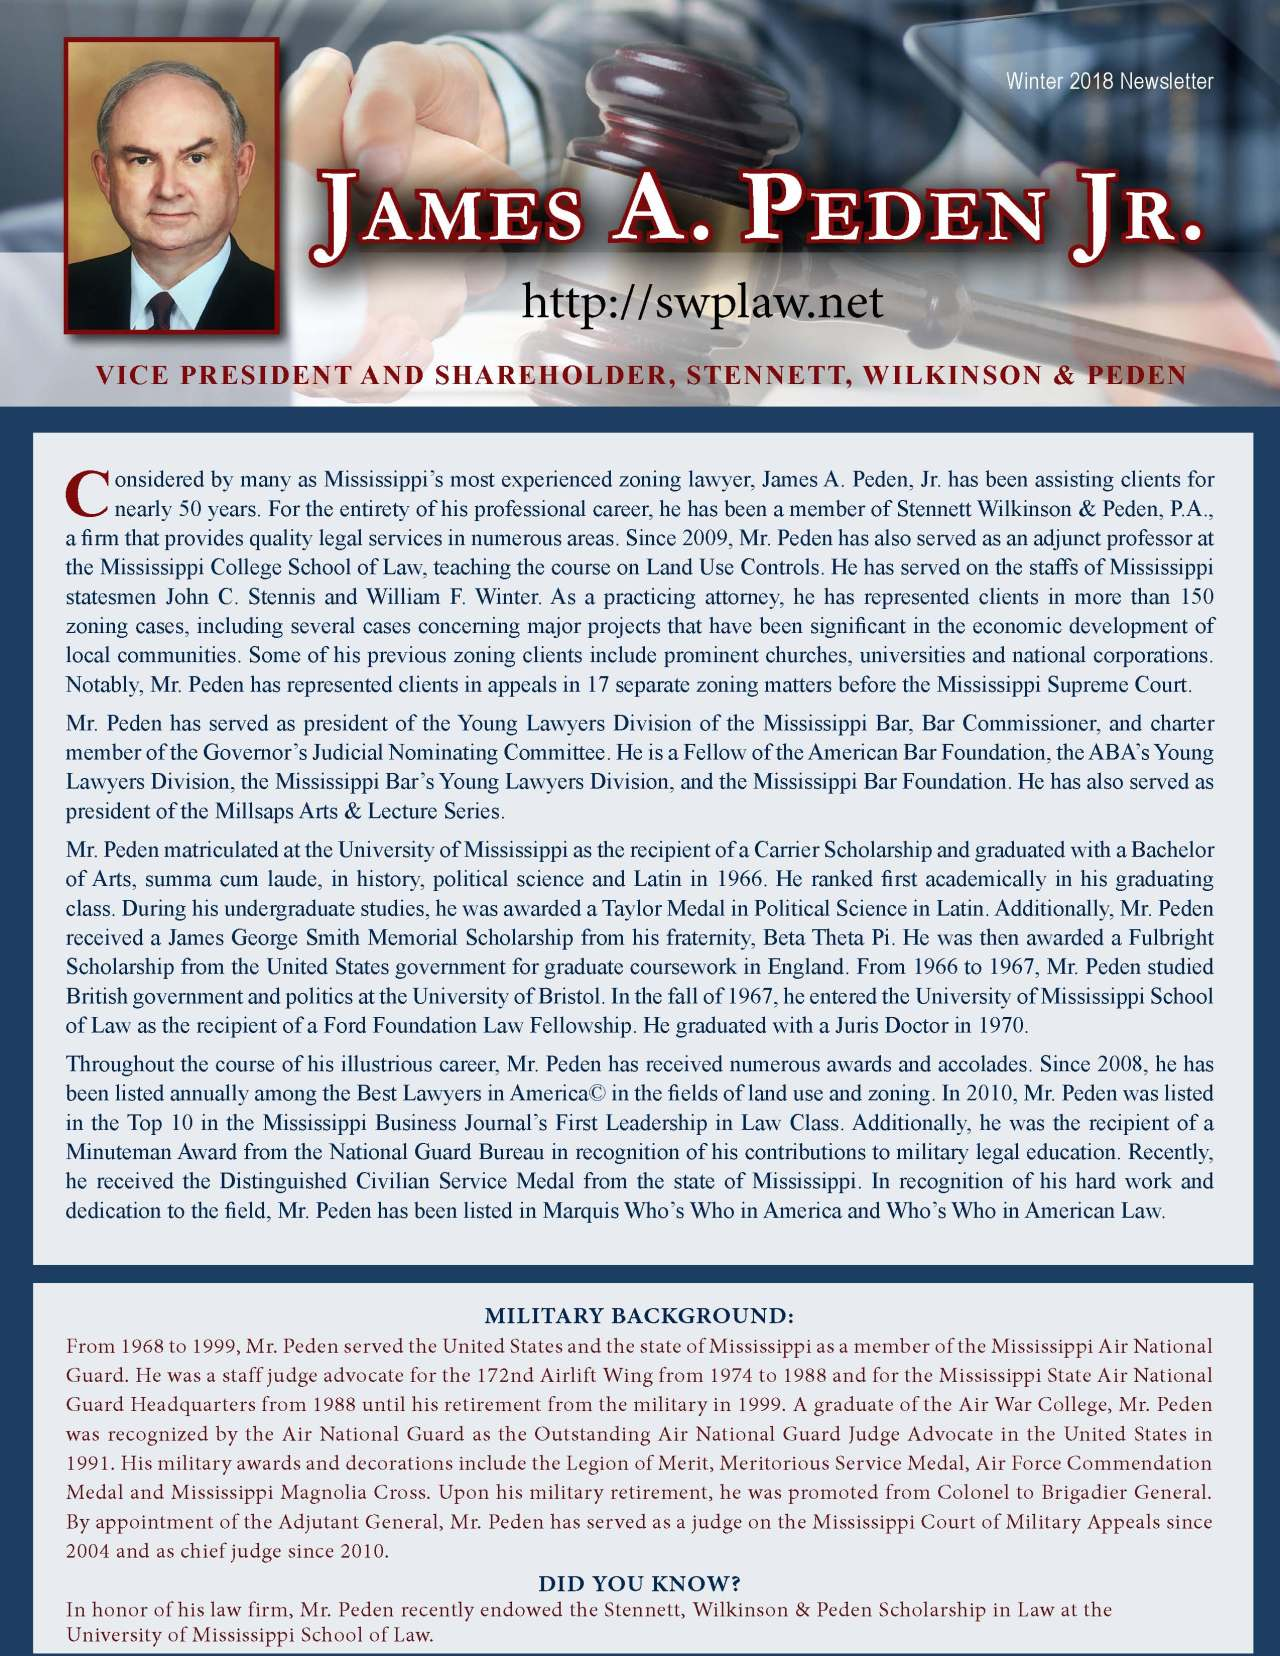 Peden, James 3681221_16911505 Newsletter REVISED.jpg